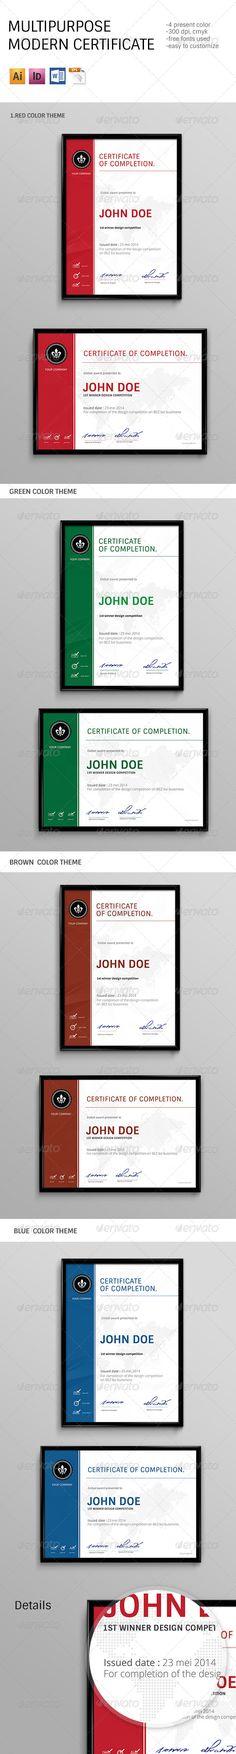 Modern Certificates Modern - Creative Certificate Designs